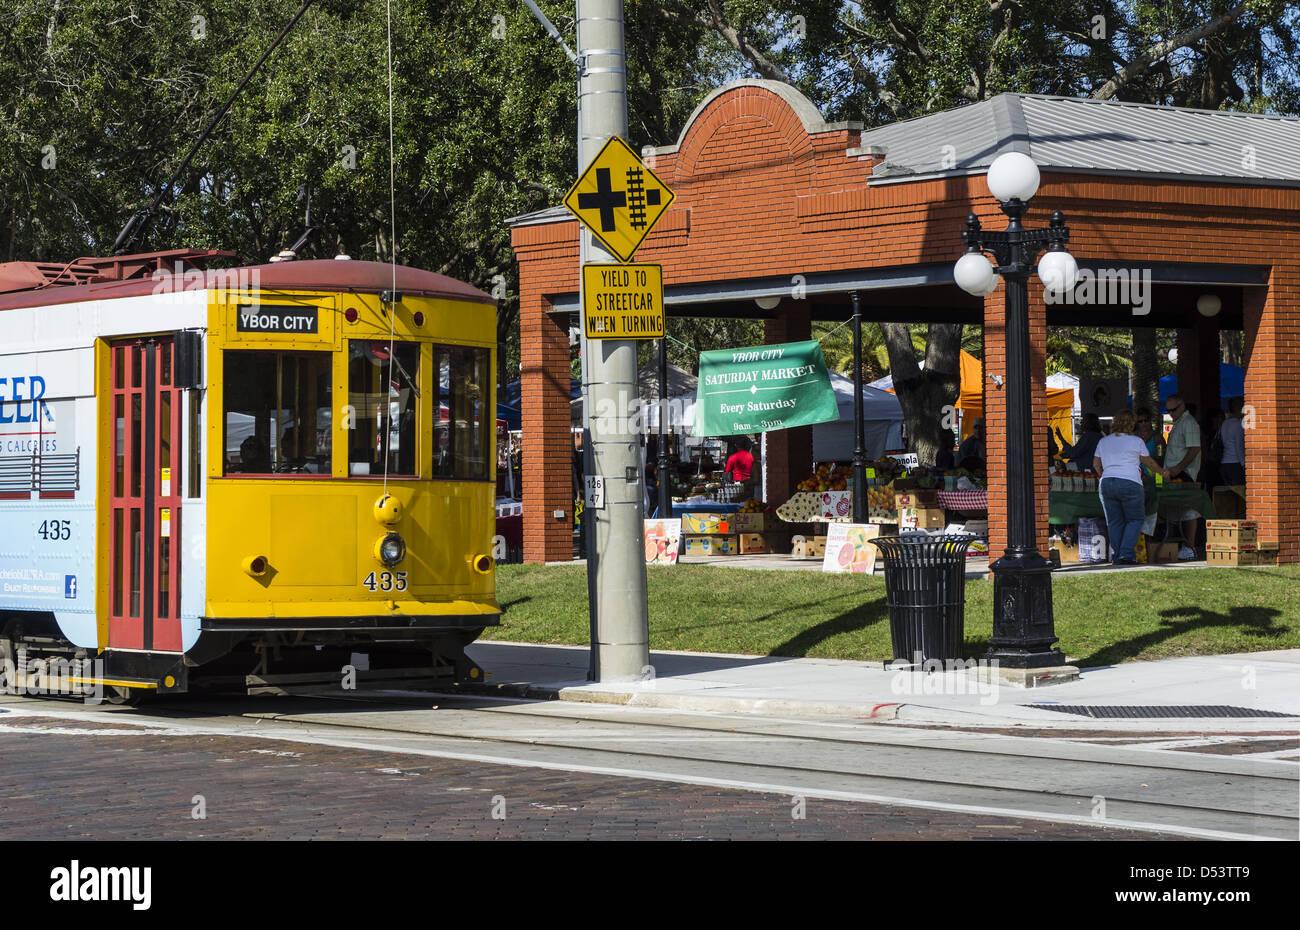 TECO Line streetcar stops at Saturday Market in historic Ybor City District. - Stock Image